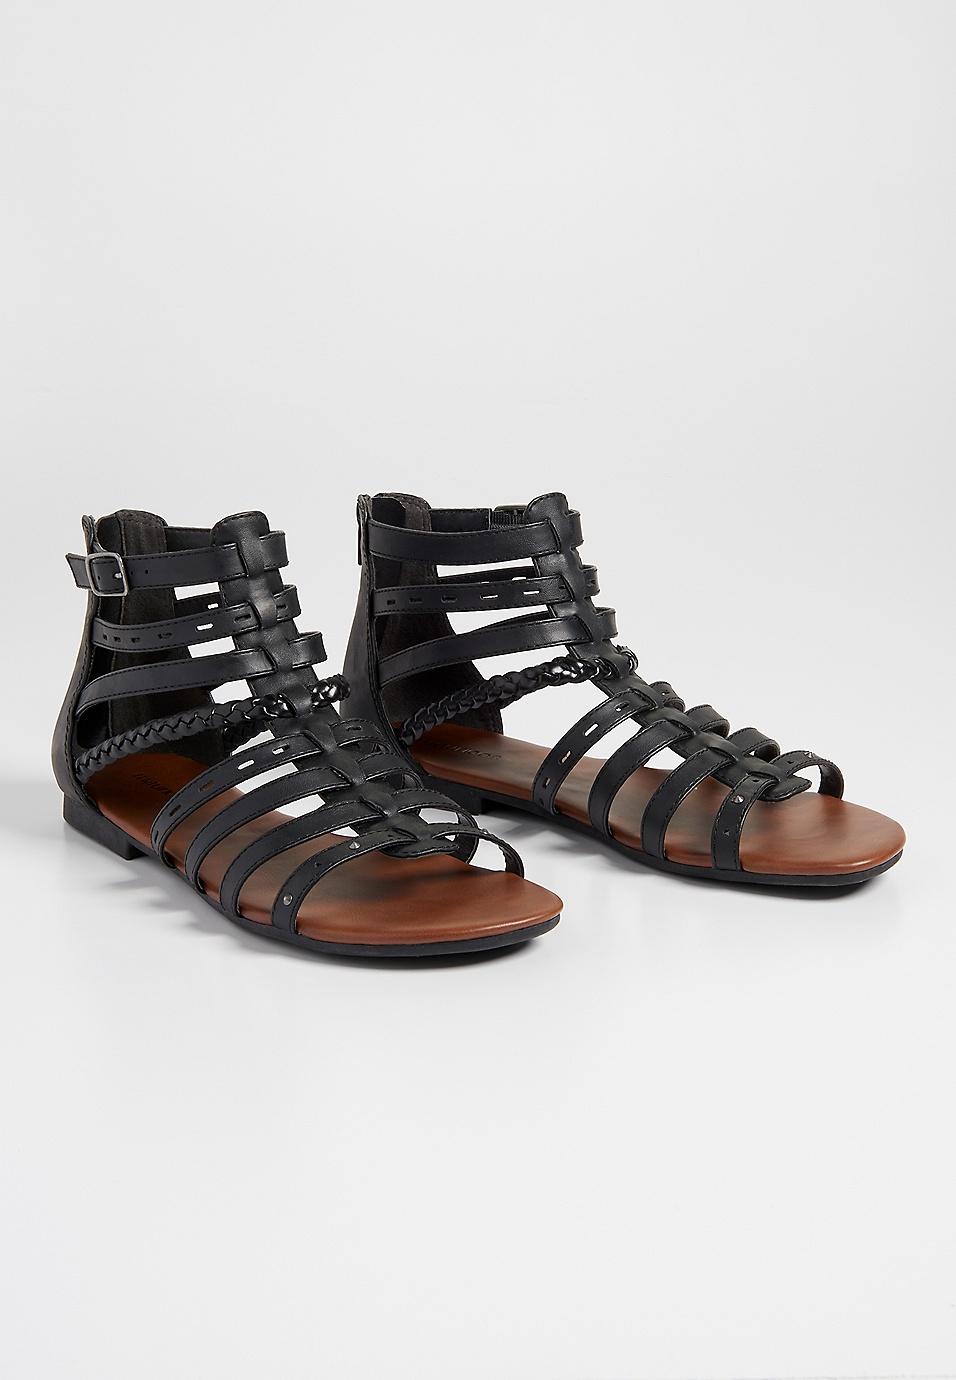 33747b63d923 Alexis braided strap gladiator sandal